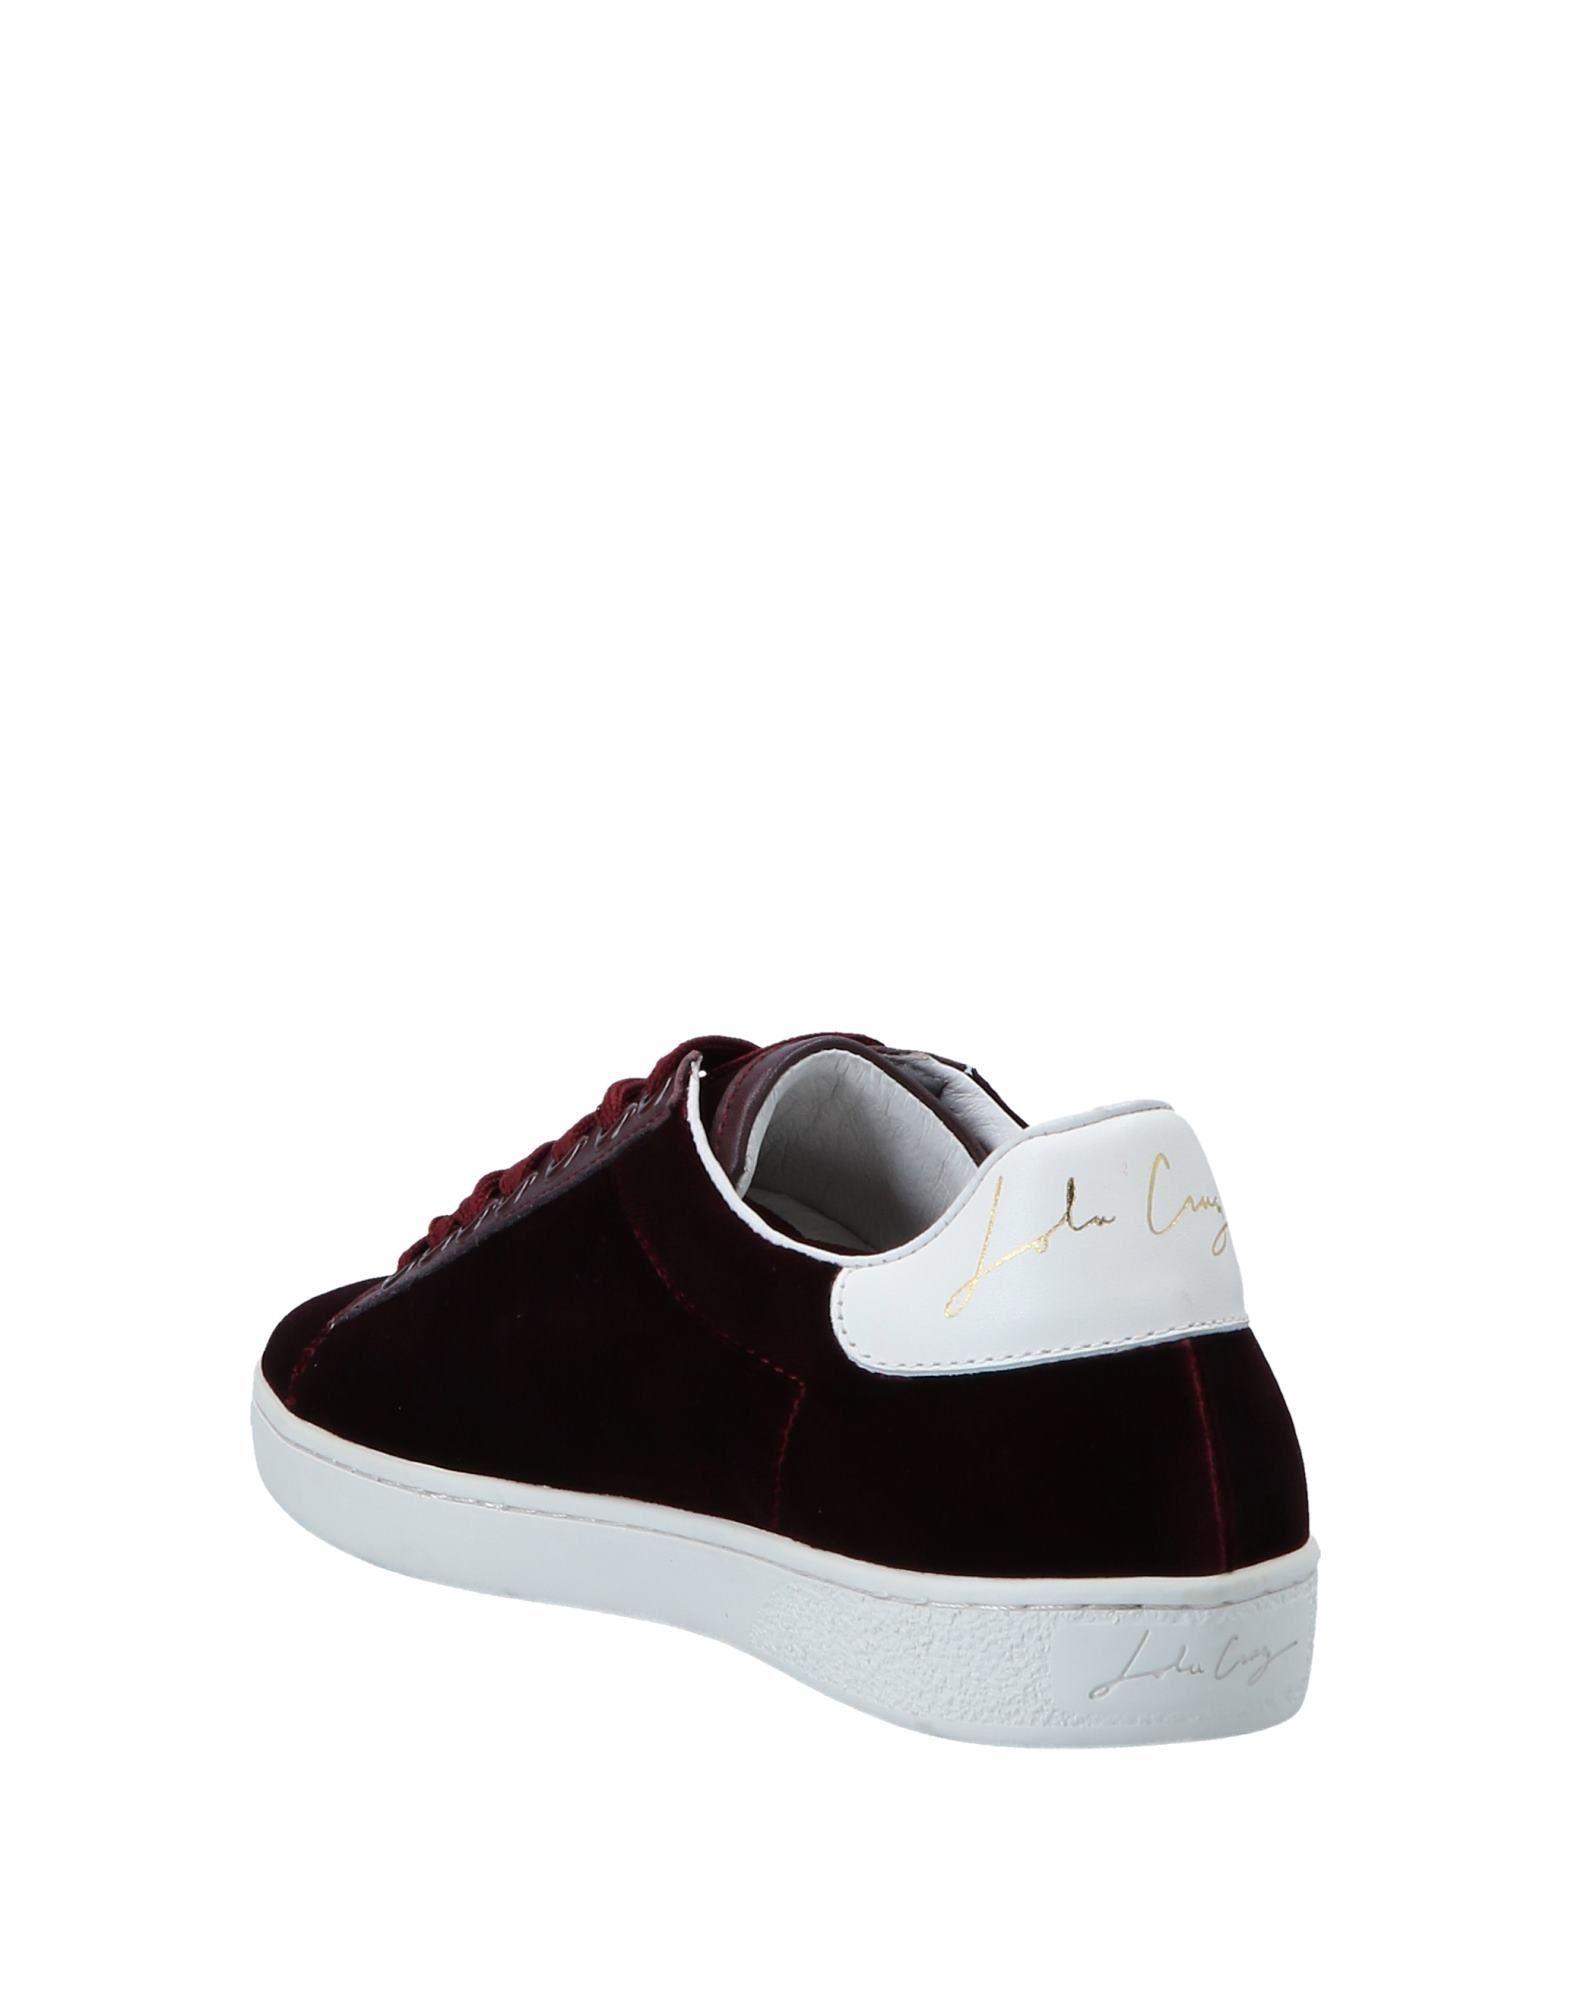 quality design 1832f 0ae04 lola-cruz-Deep-purple-Low-tops-Sneakers.jpeg